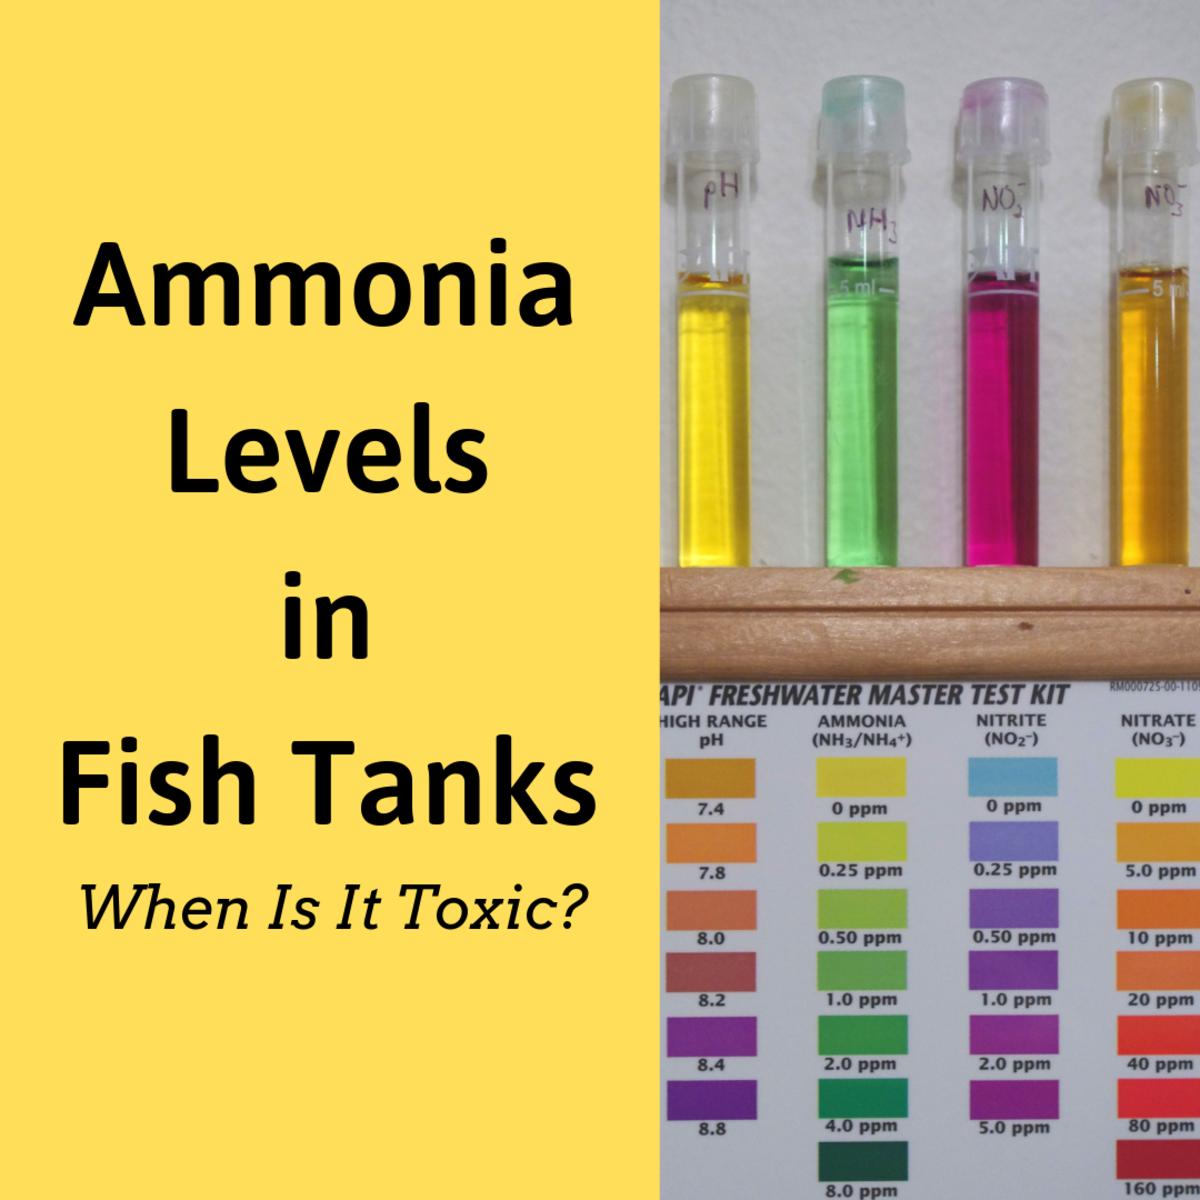 Ammonia Levels In Fish Tanks